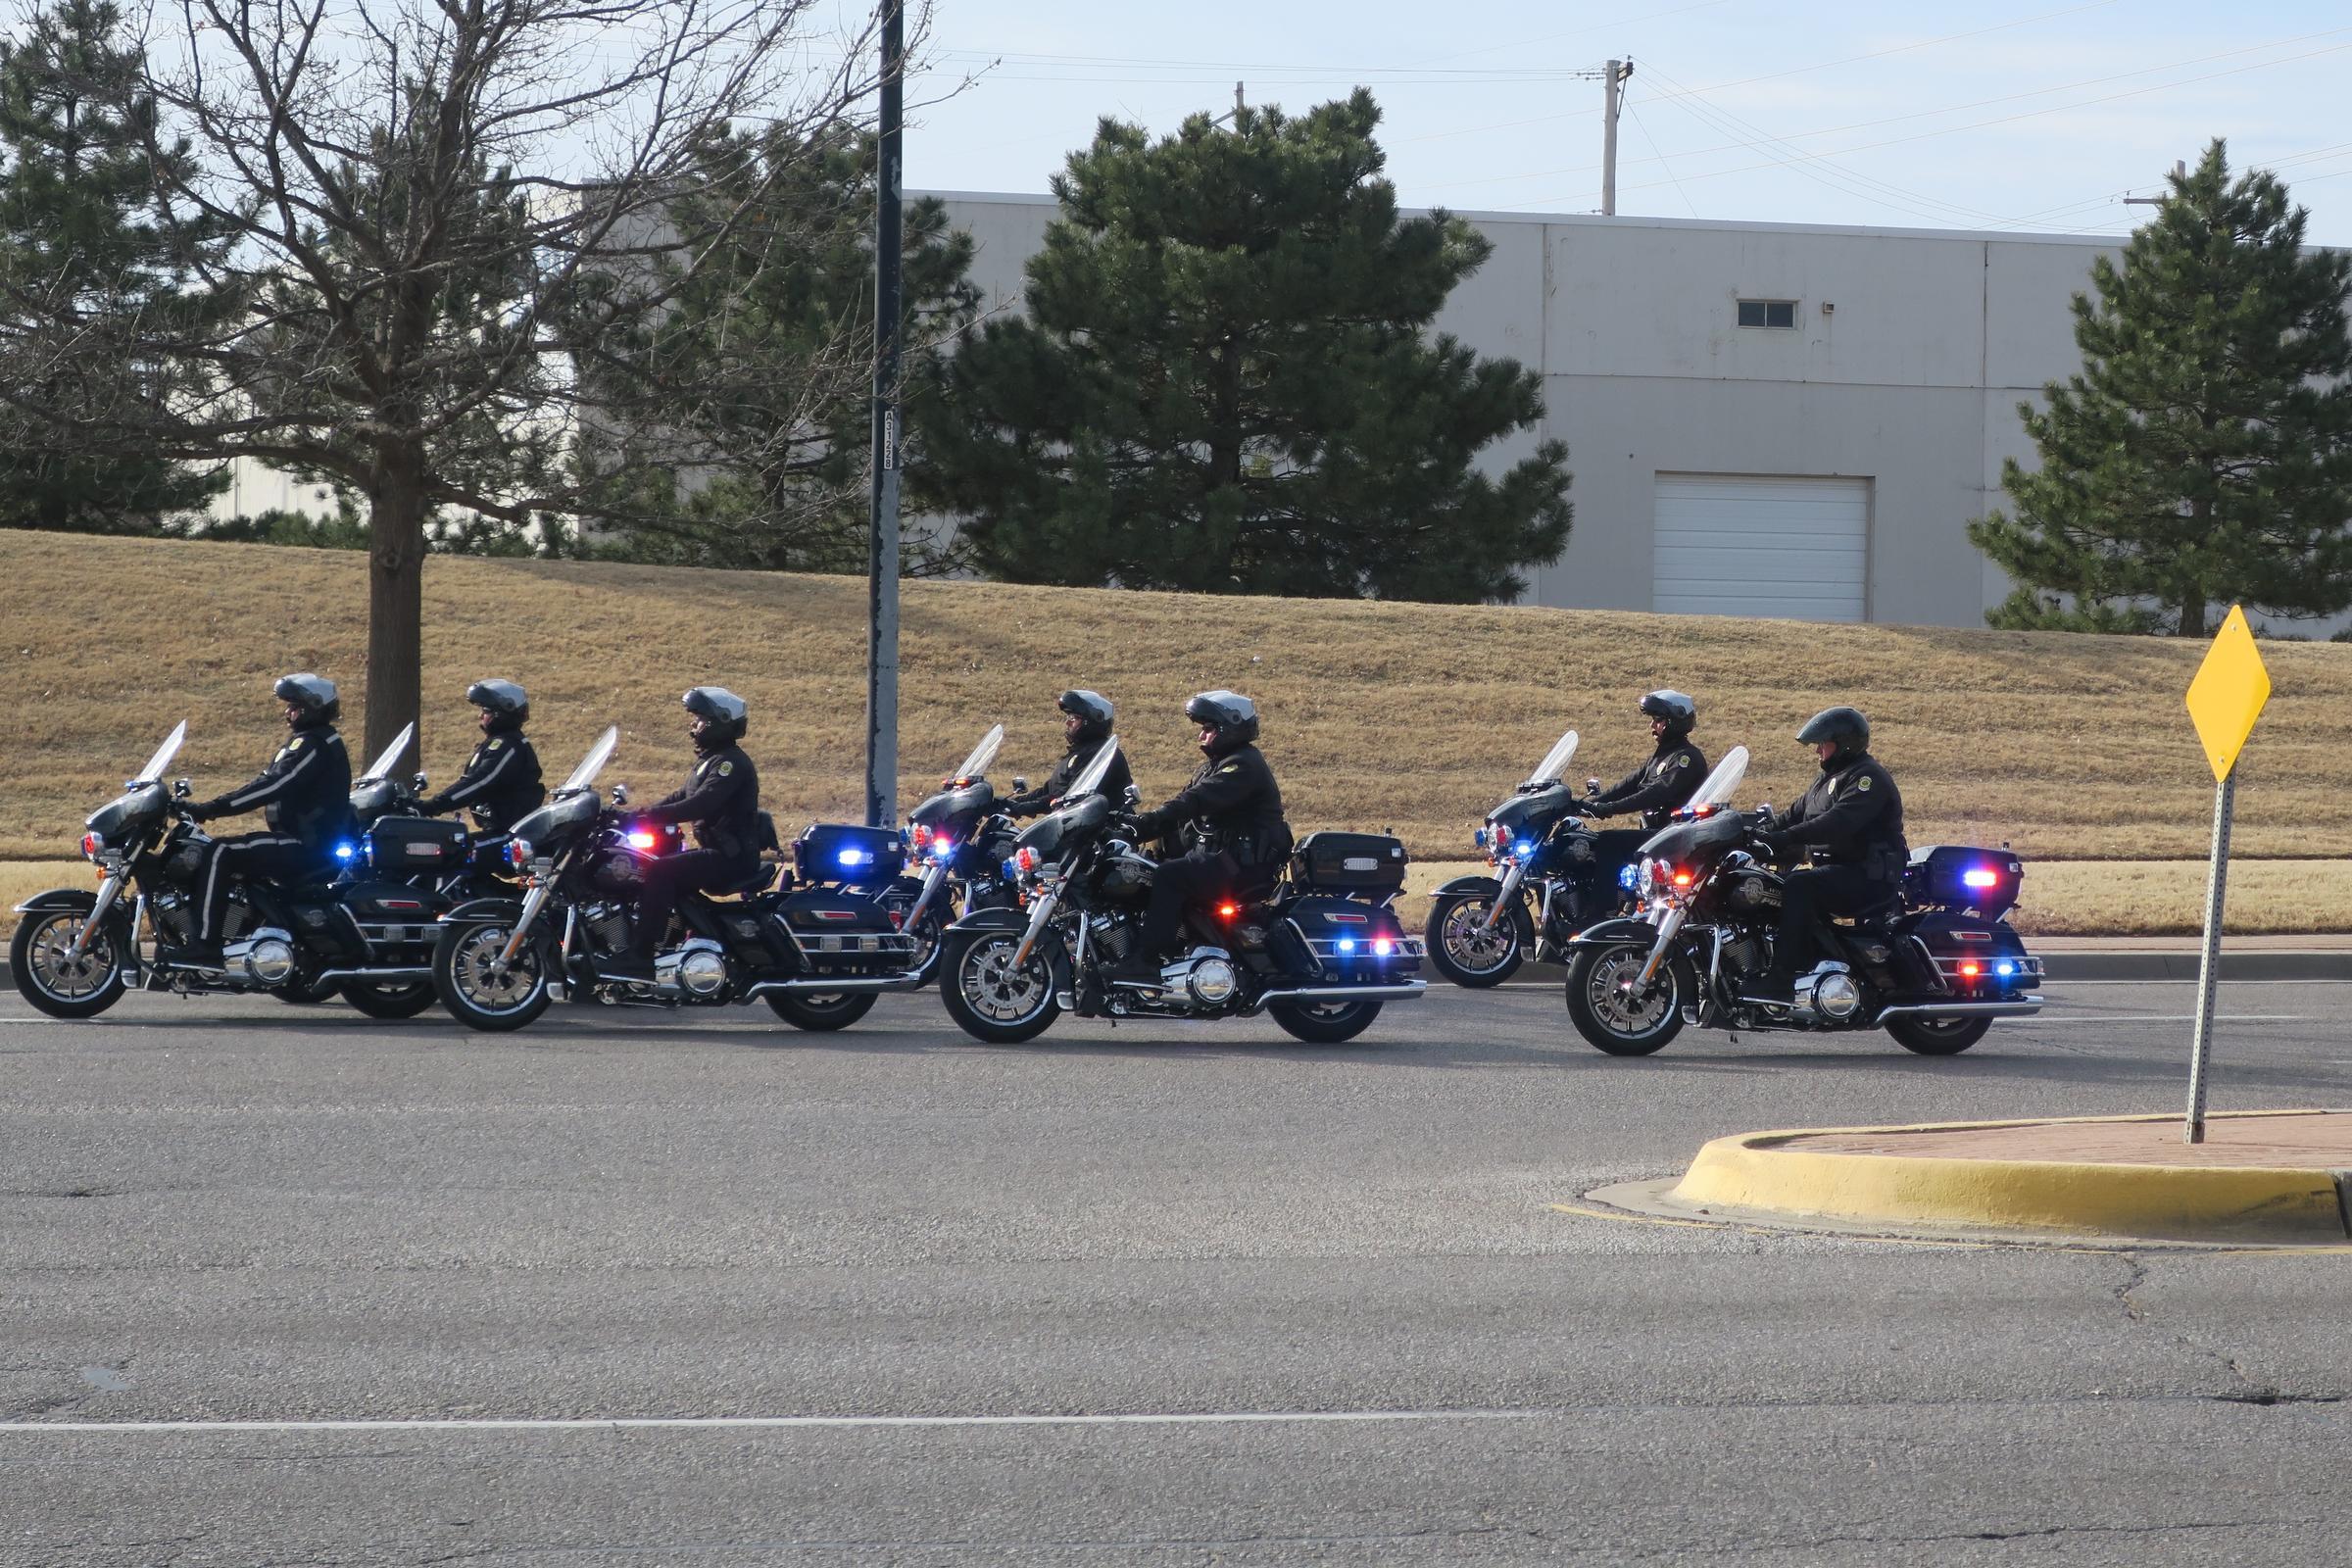 Department Of Motor Vehicles Wichita Ks - impremedia.net